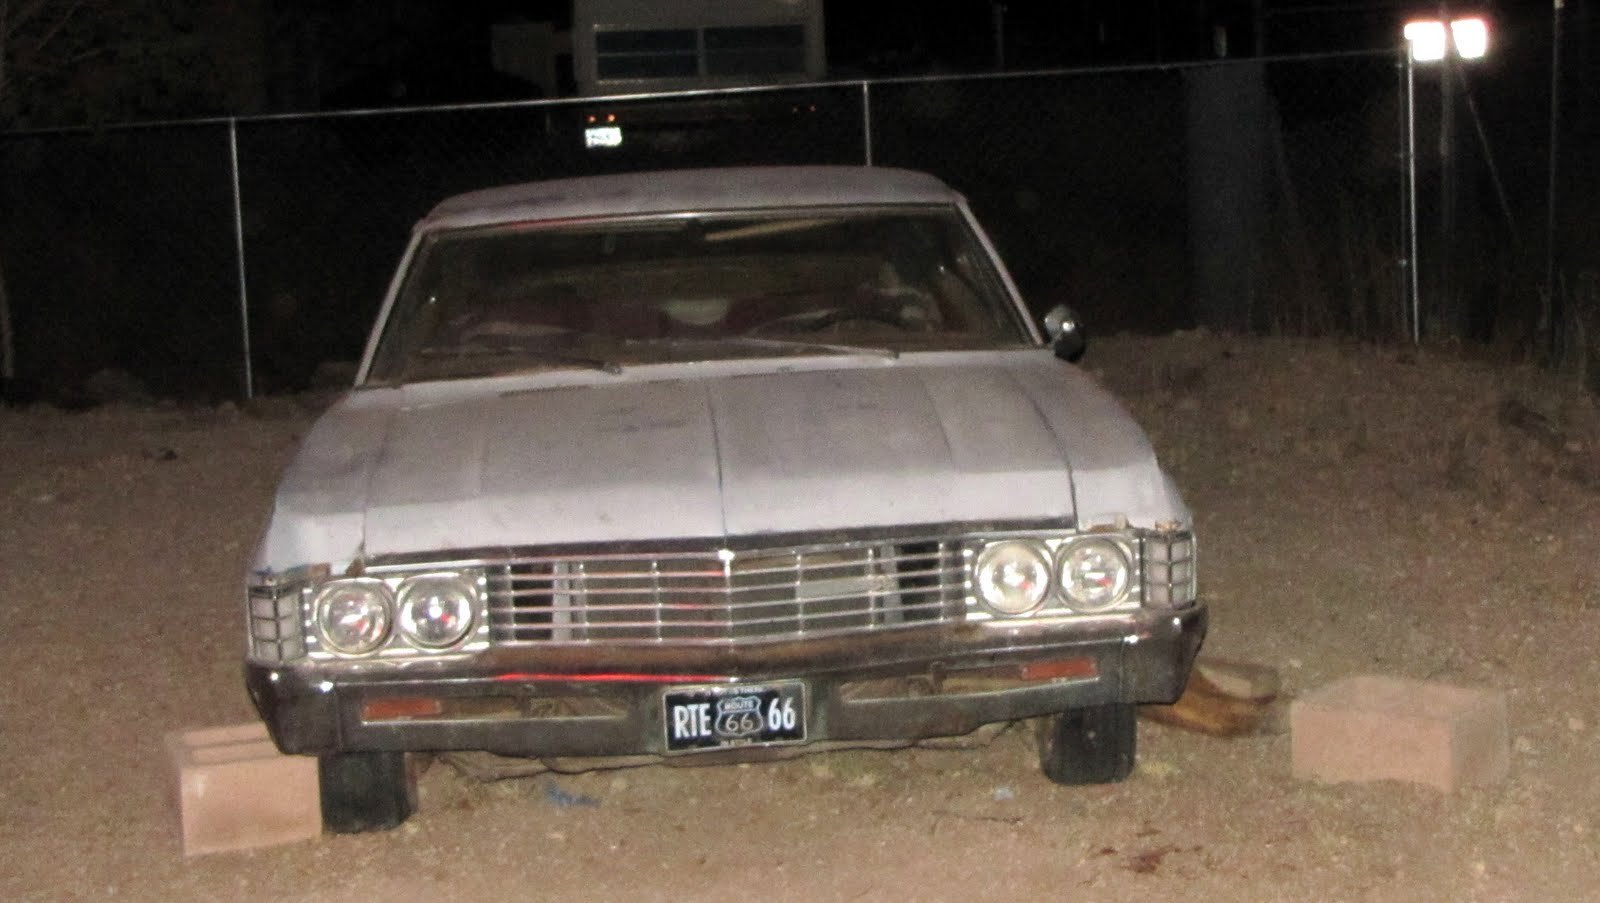 Route 66, Arizona, 1968 Chevrolet Impala